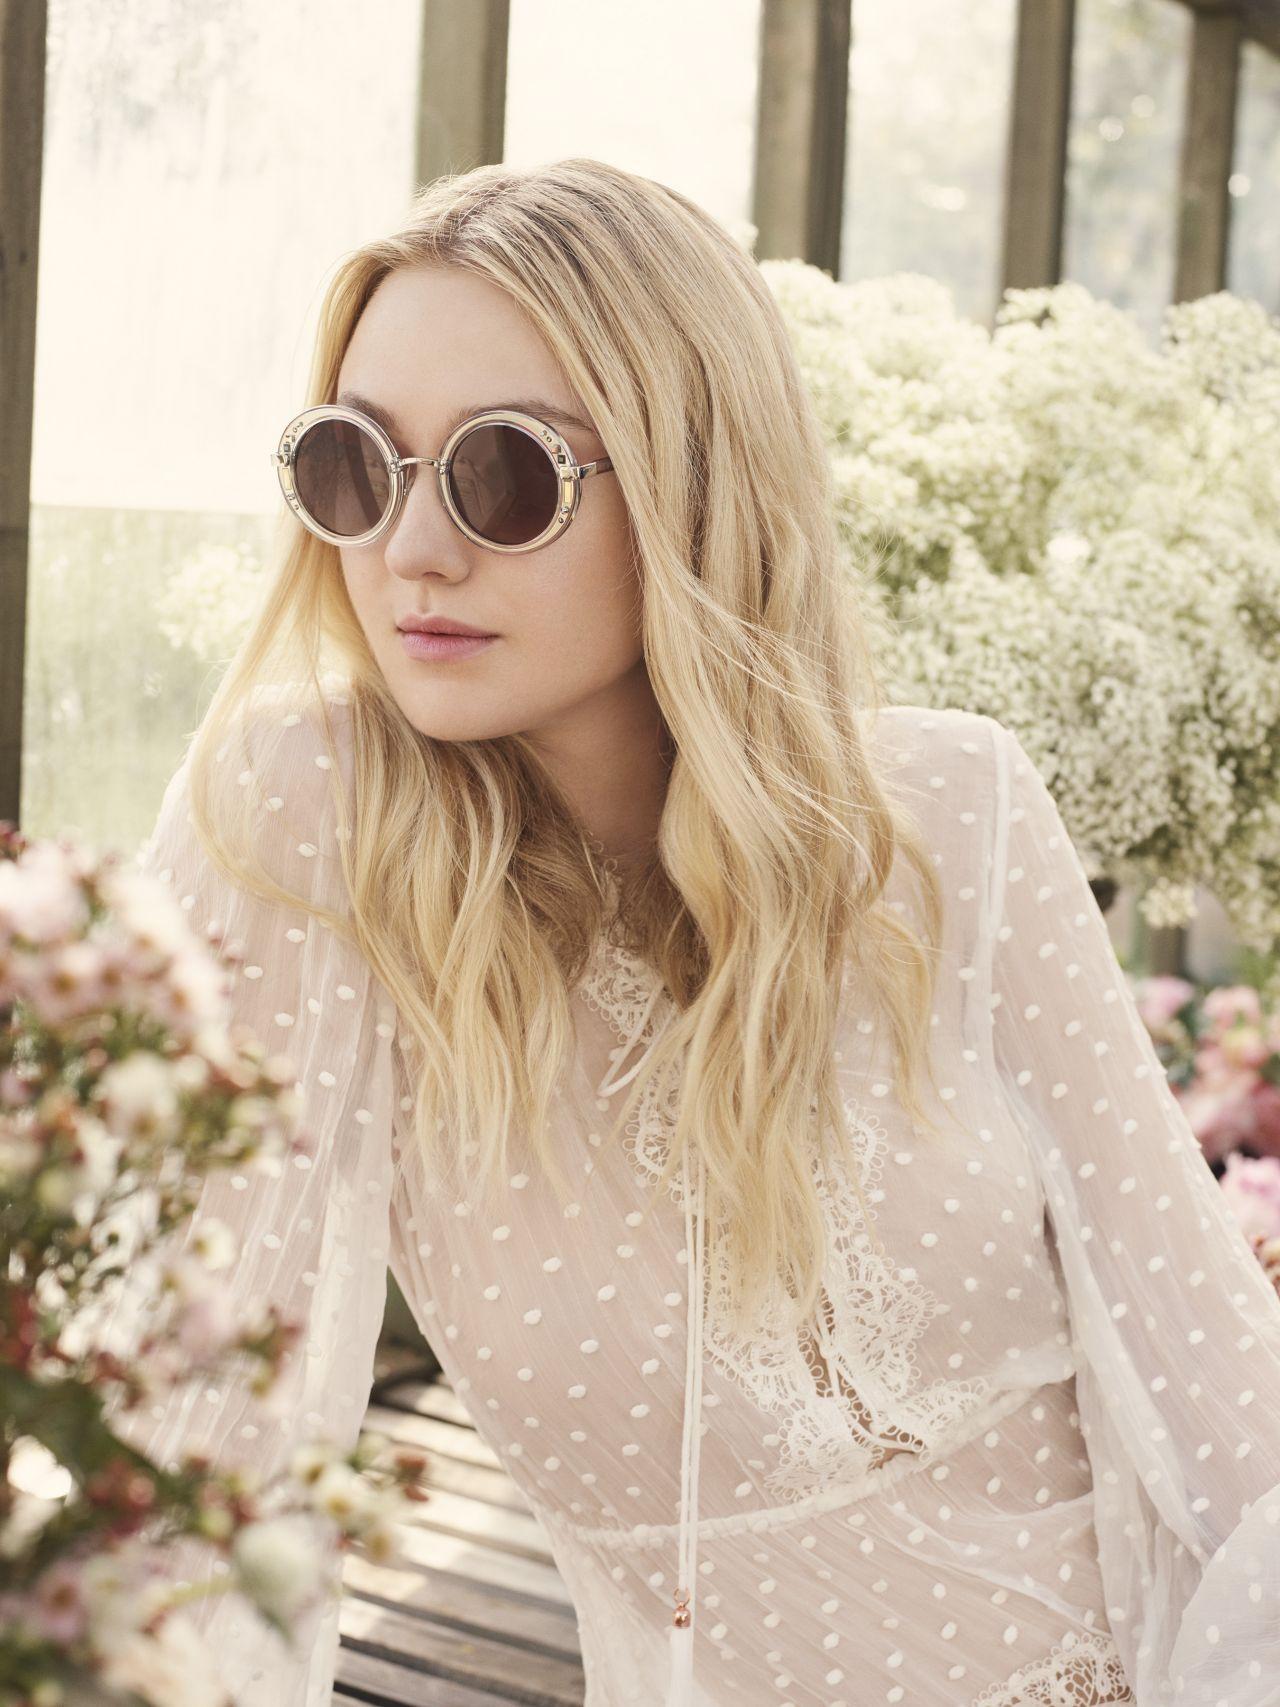 Dakota Fanning Photoshoot For Jimmy Choo Spring Summer 2017